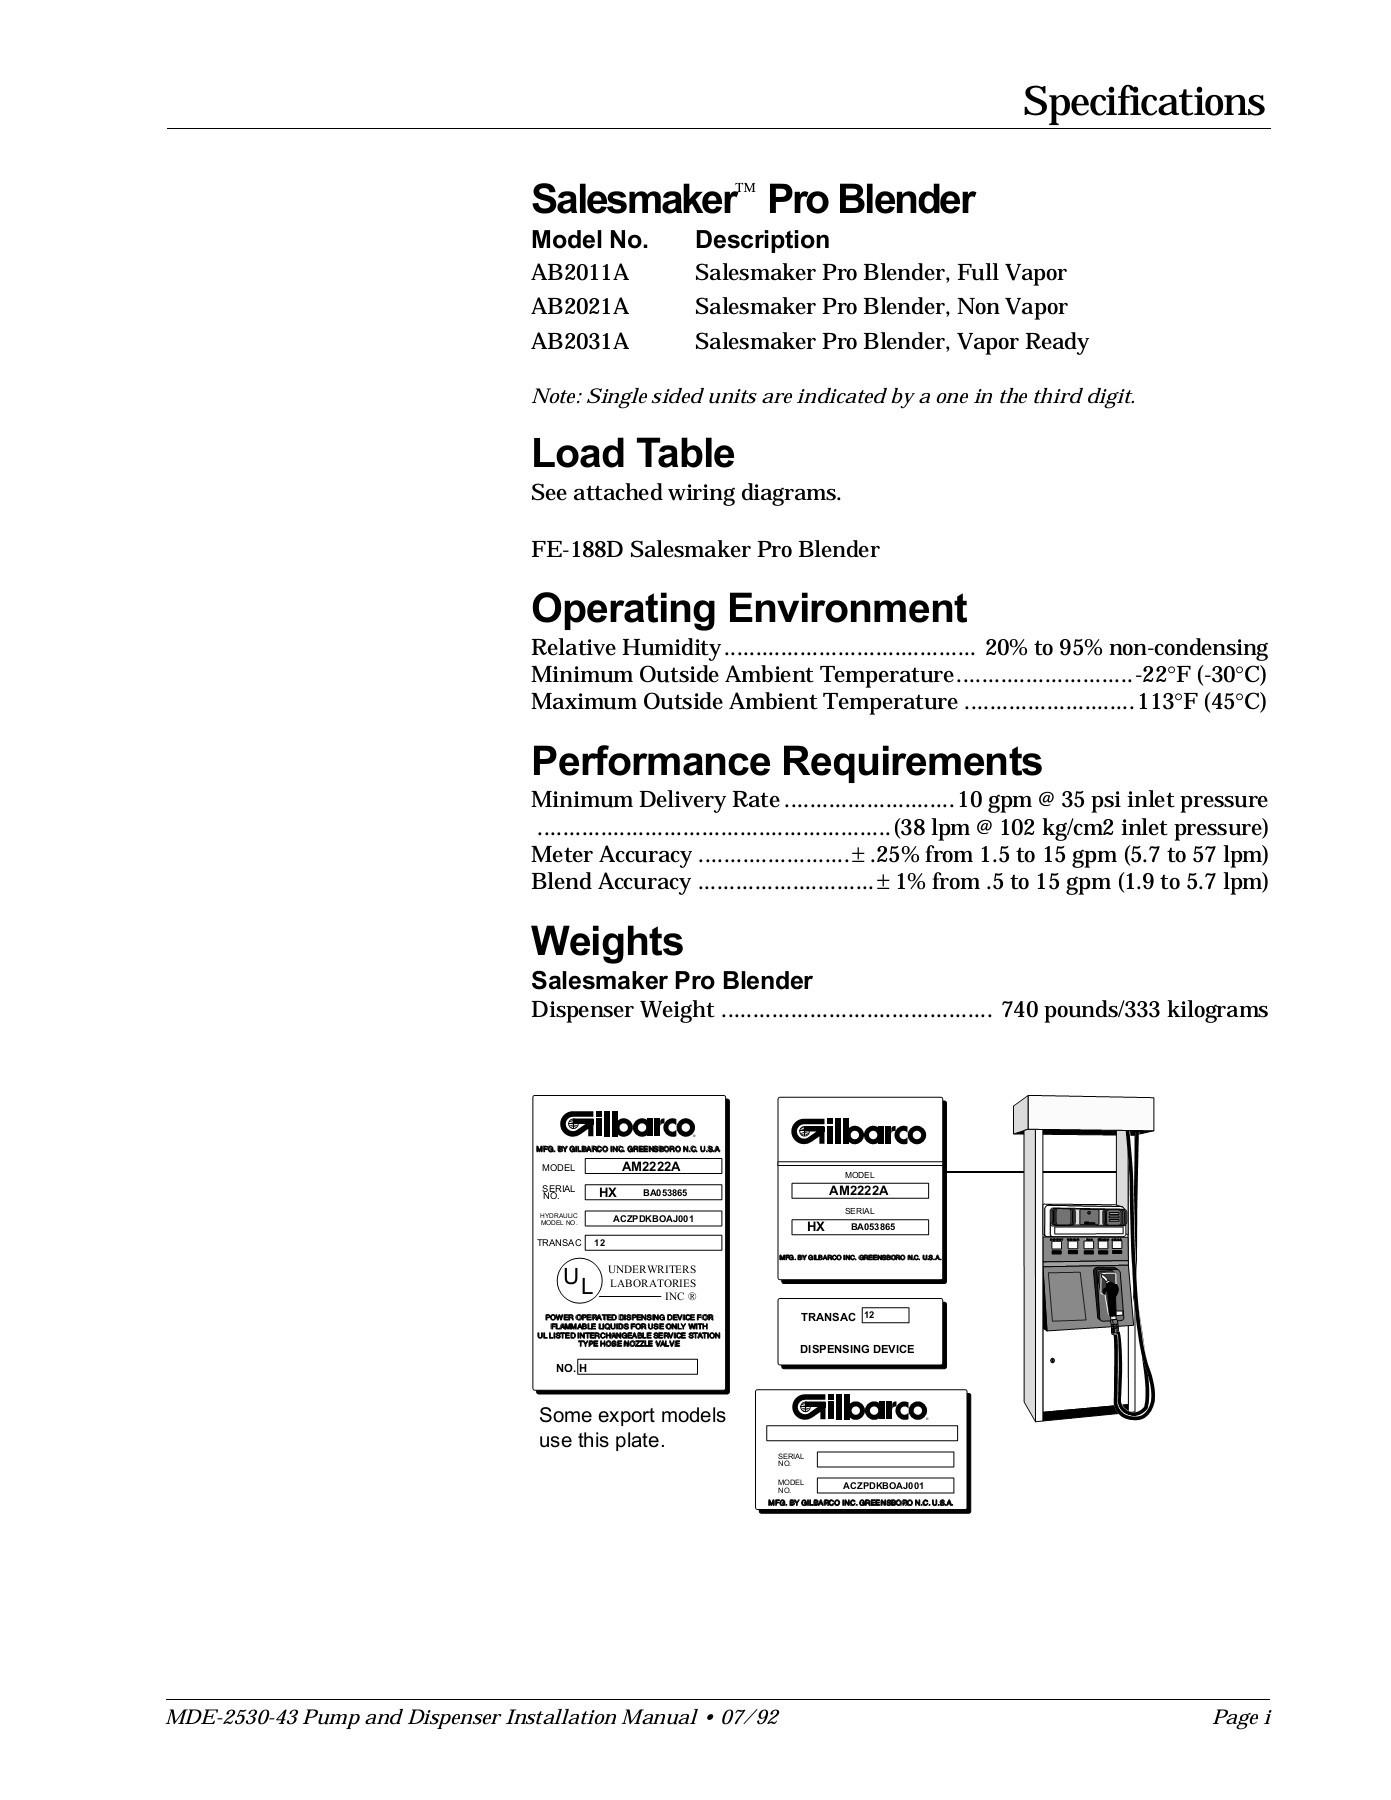 Salesmaker Pro Blender Petroleum Equipment Service Fliphtml5 Gilbarco Gas Pump Wiring Diagram